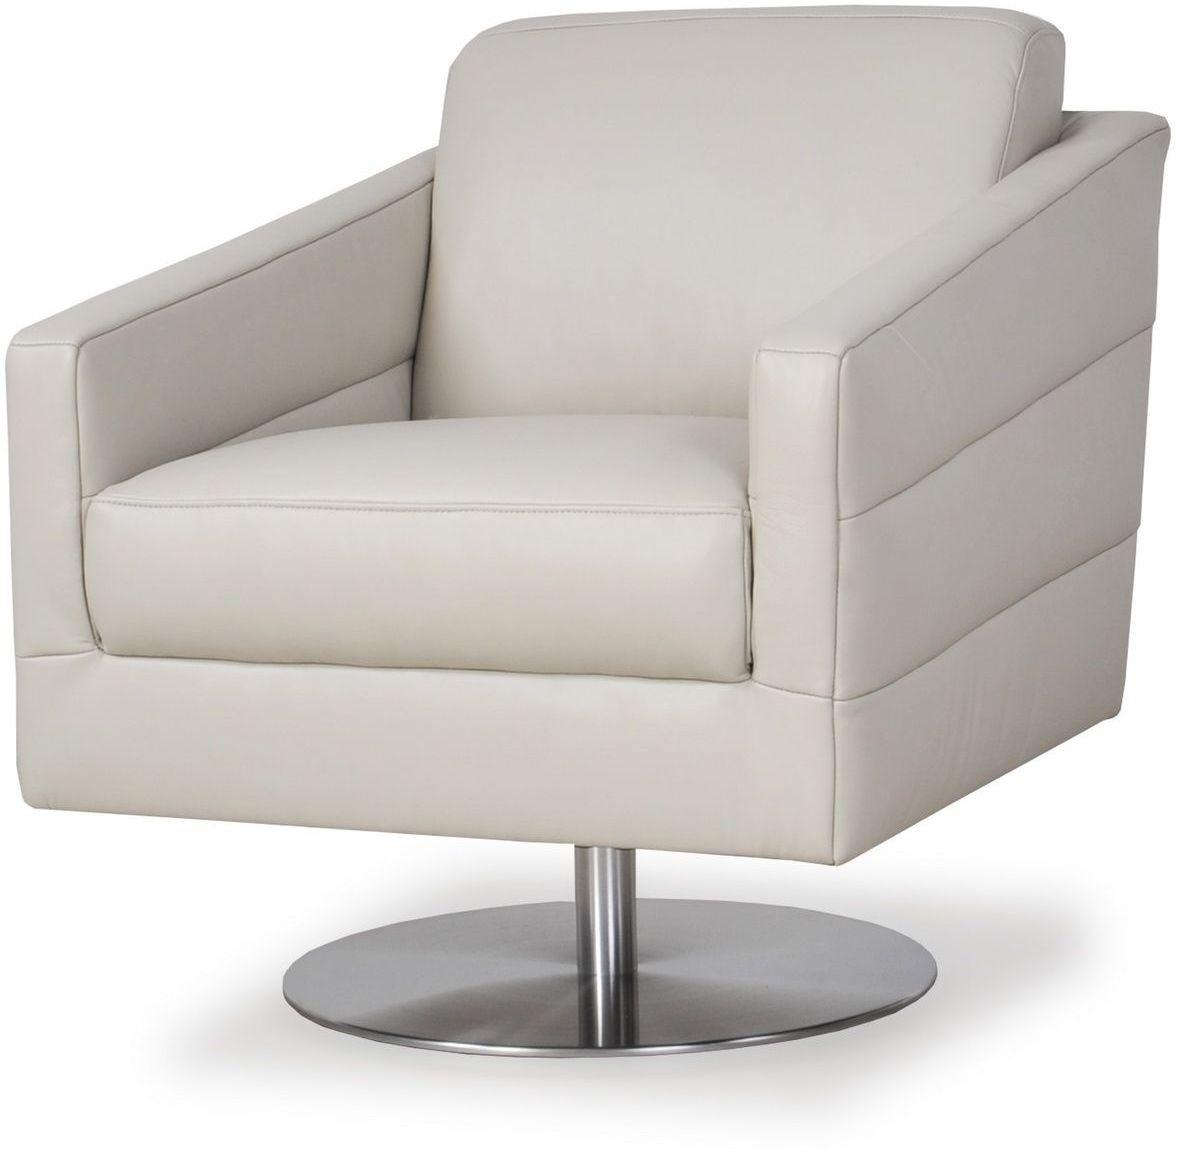 Eagle Pure Grey Grain Leather Swivel Chair 55106B1189 Moroni